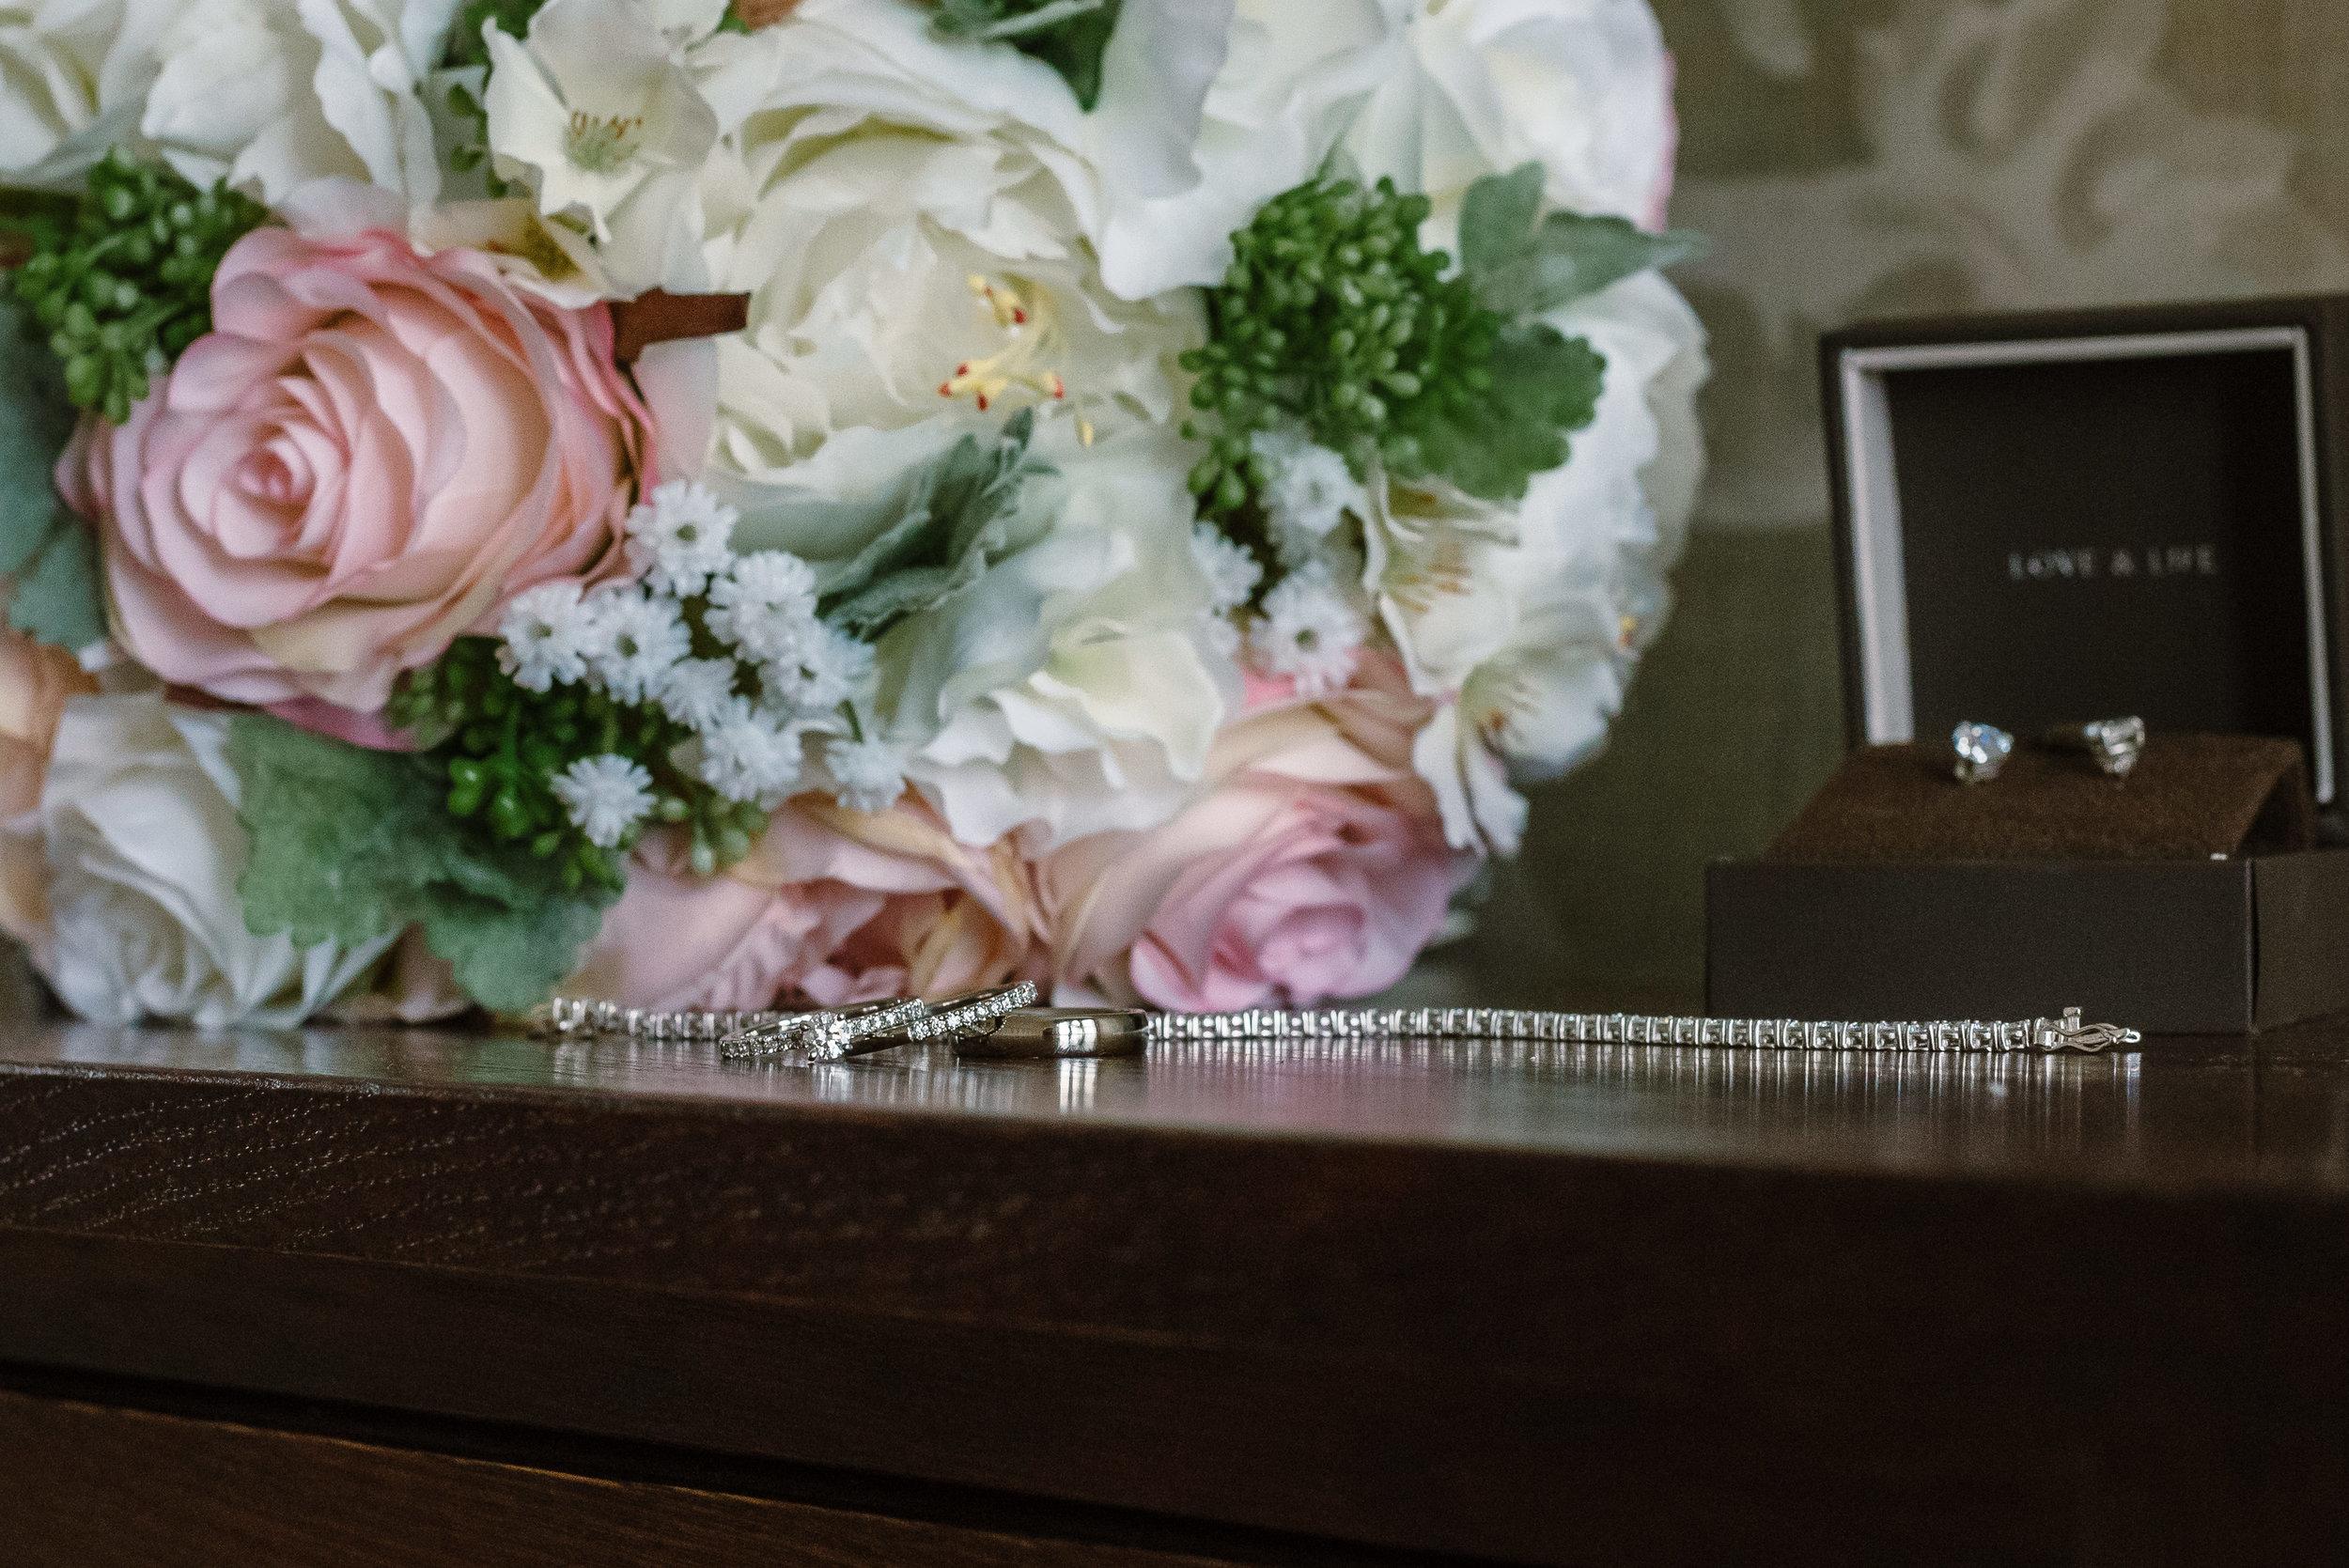 Sarah-Fishlock-Photography : Hampshire-wedding-photographer-hampshire : fleet-wedding-photographer-fleet : Northbrook-Park-Wedding-Photographer : Northbrook-Park-Wedding-Venue : natural-wedding-photographer-hampshire-11.jpg